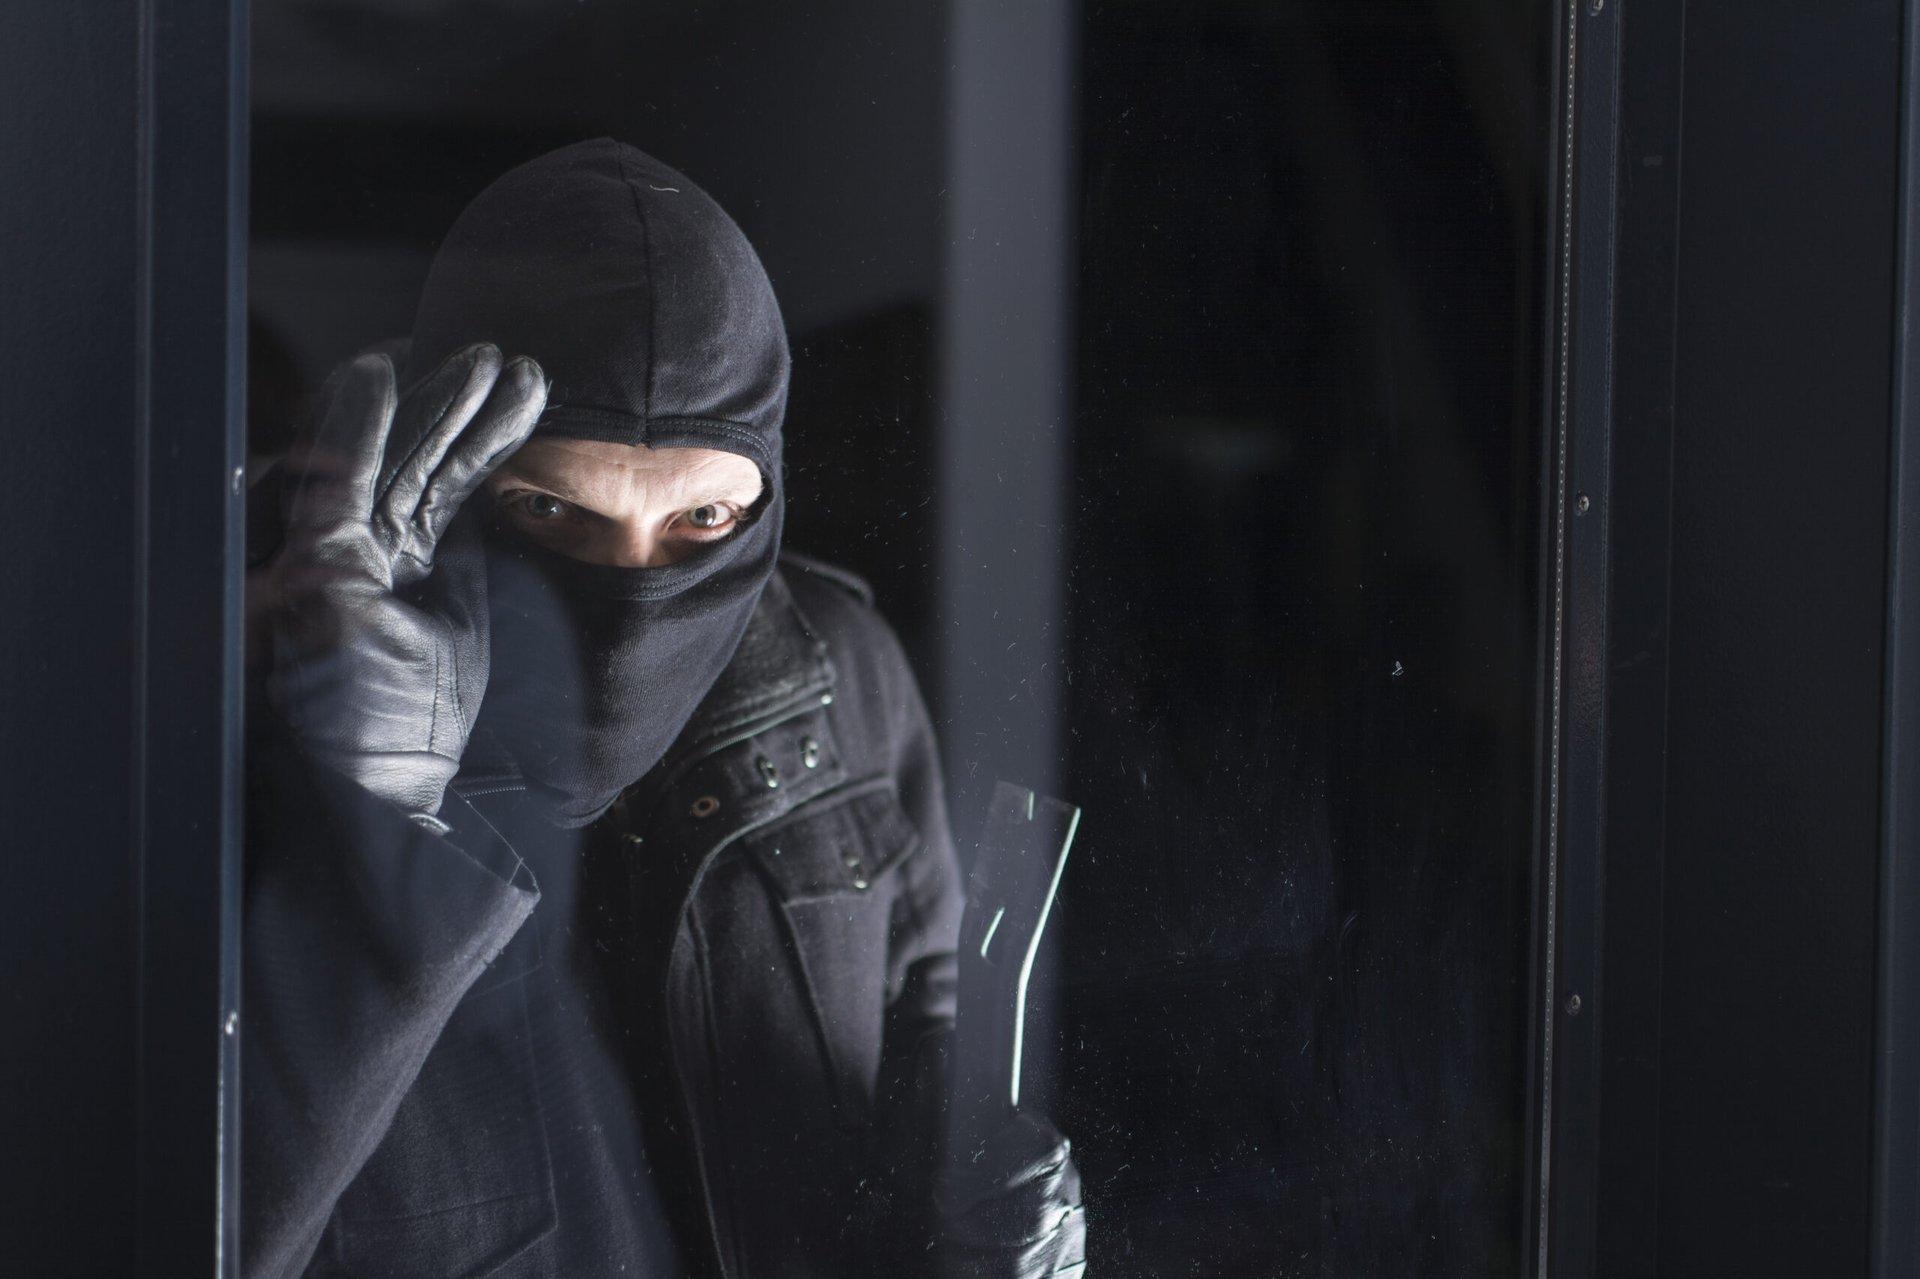 Burglar peering into a home